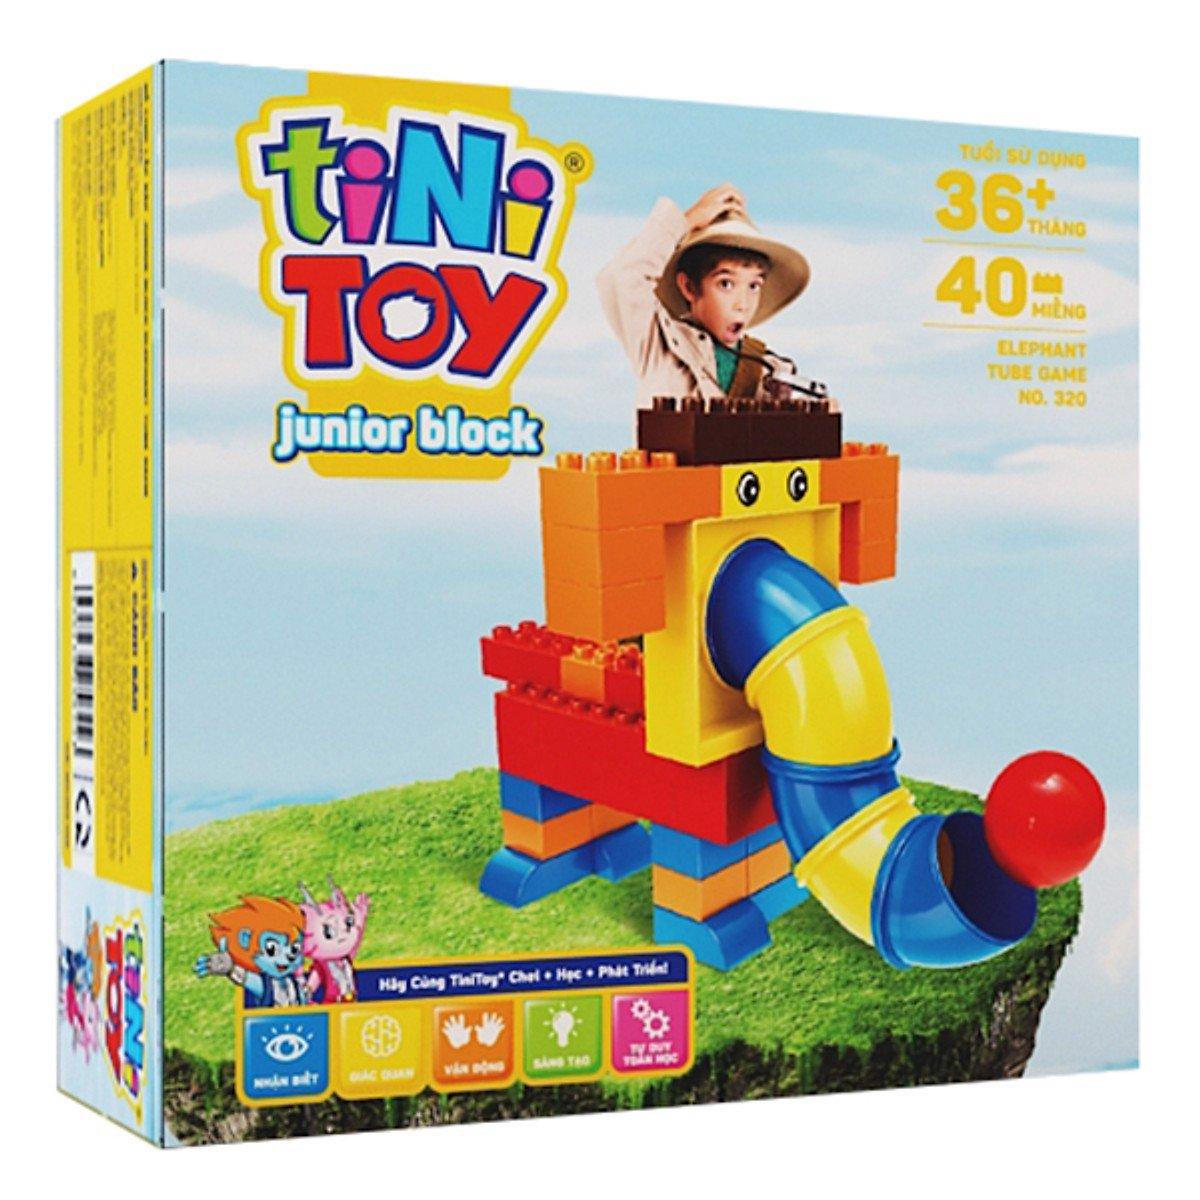 Đồ chơi lắp ráp Junior Block Elephant TubeGame (TN)